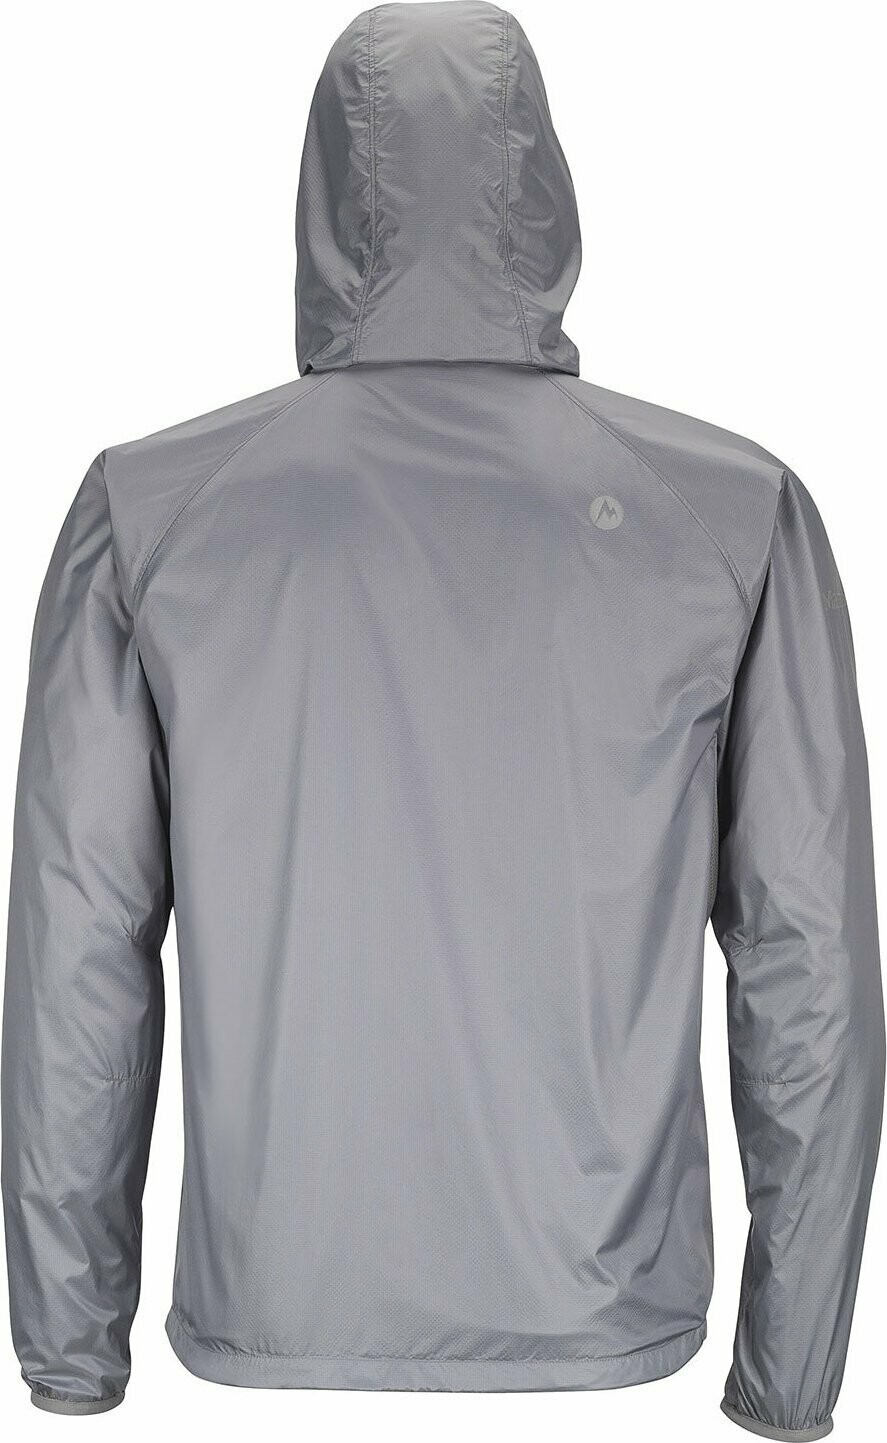 Marmot ETHER DRICLIME HOODY lined wind jacket - MEN'S, XLarge